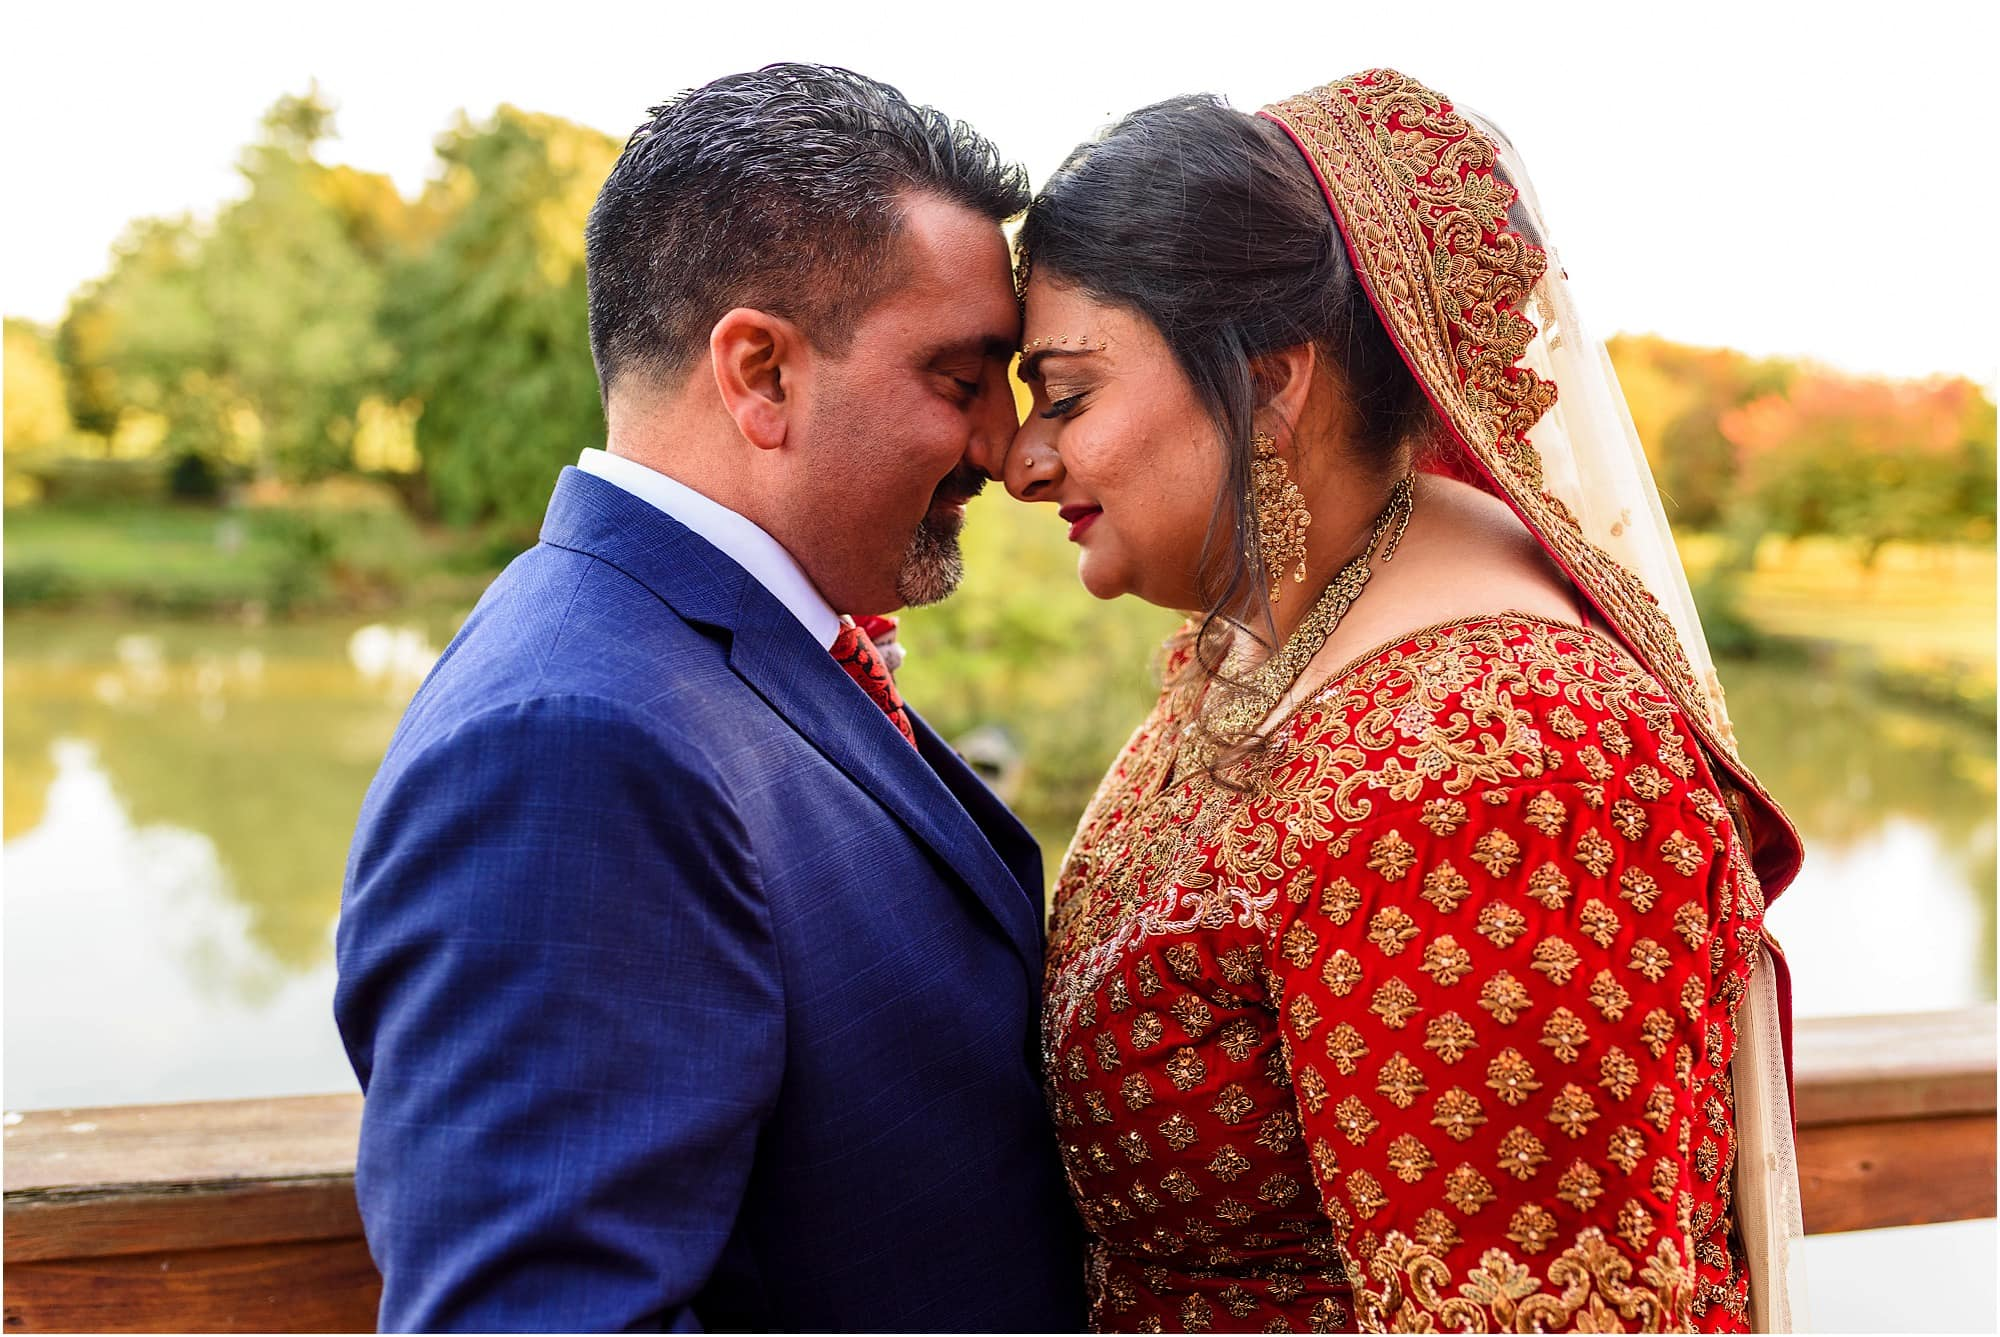 Eskimo kiss at Childerley Hall Cambridge Wedding